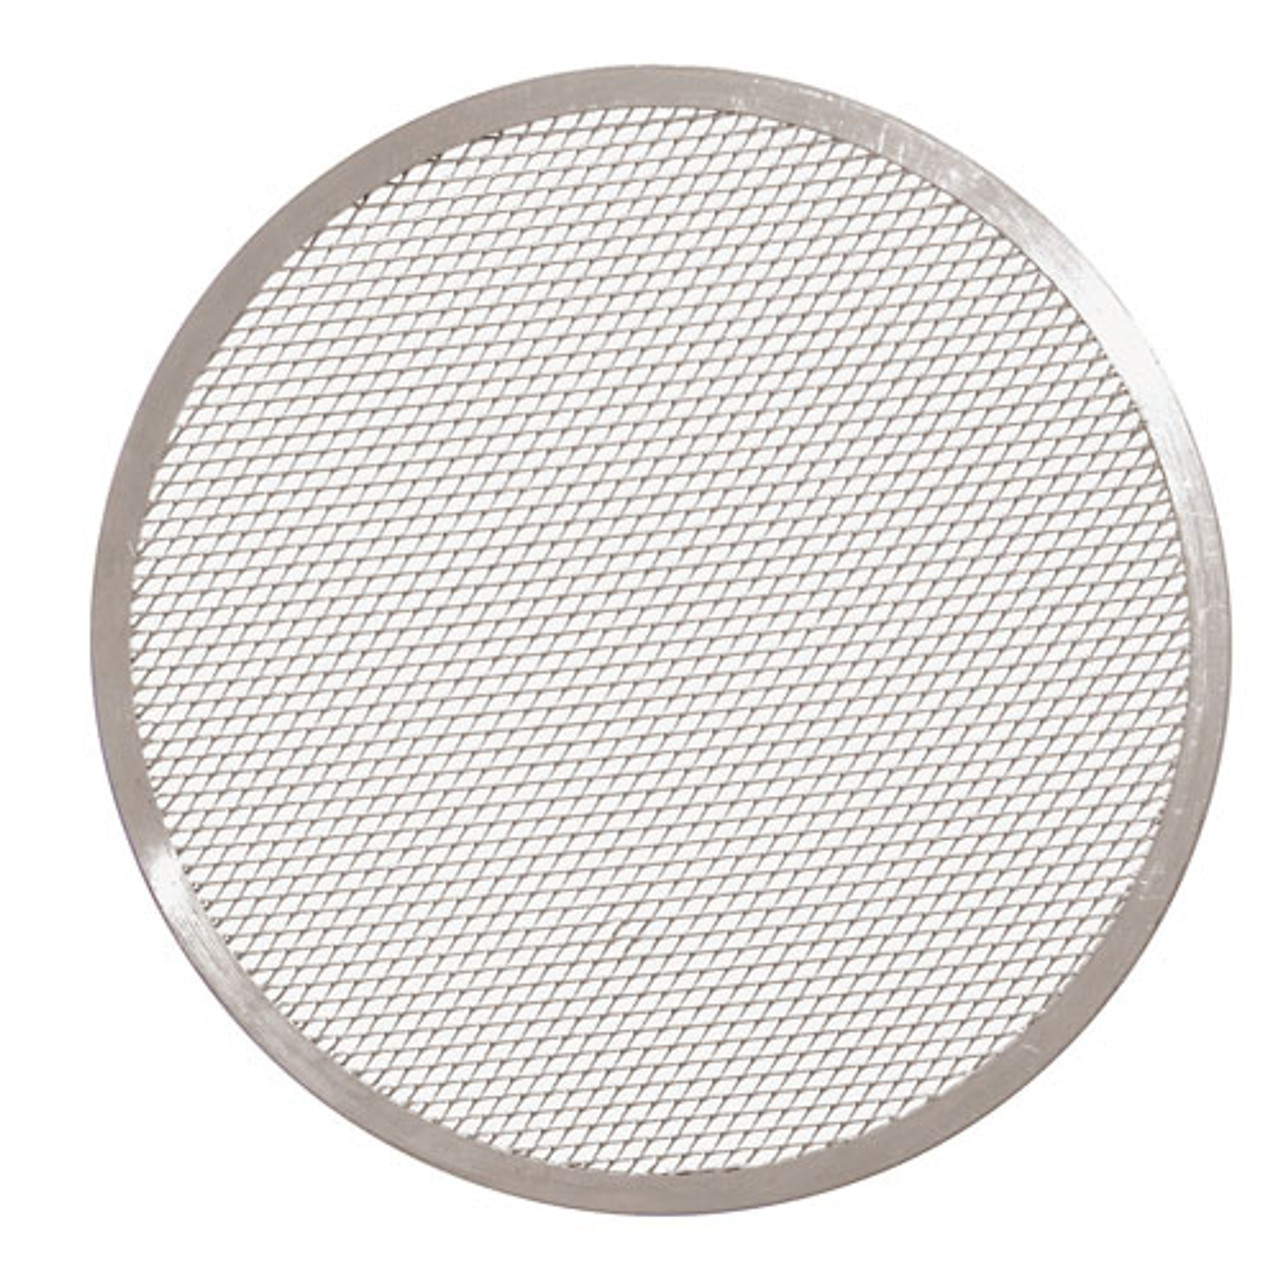 19 5/8 Aluminum Pizza Screen, L 19.625 x W 19.625 x H 0.25